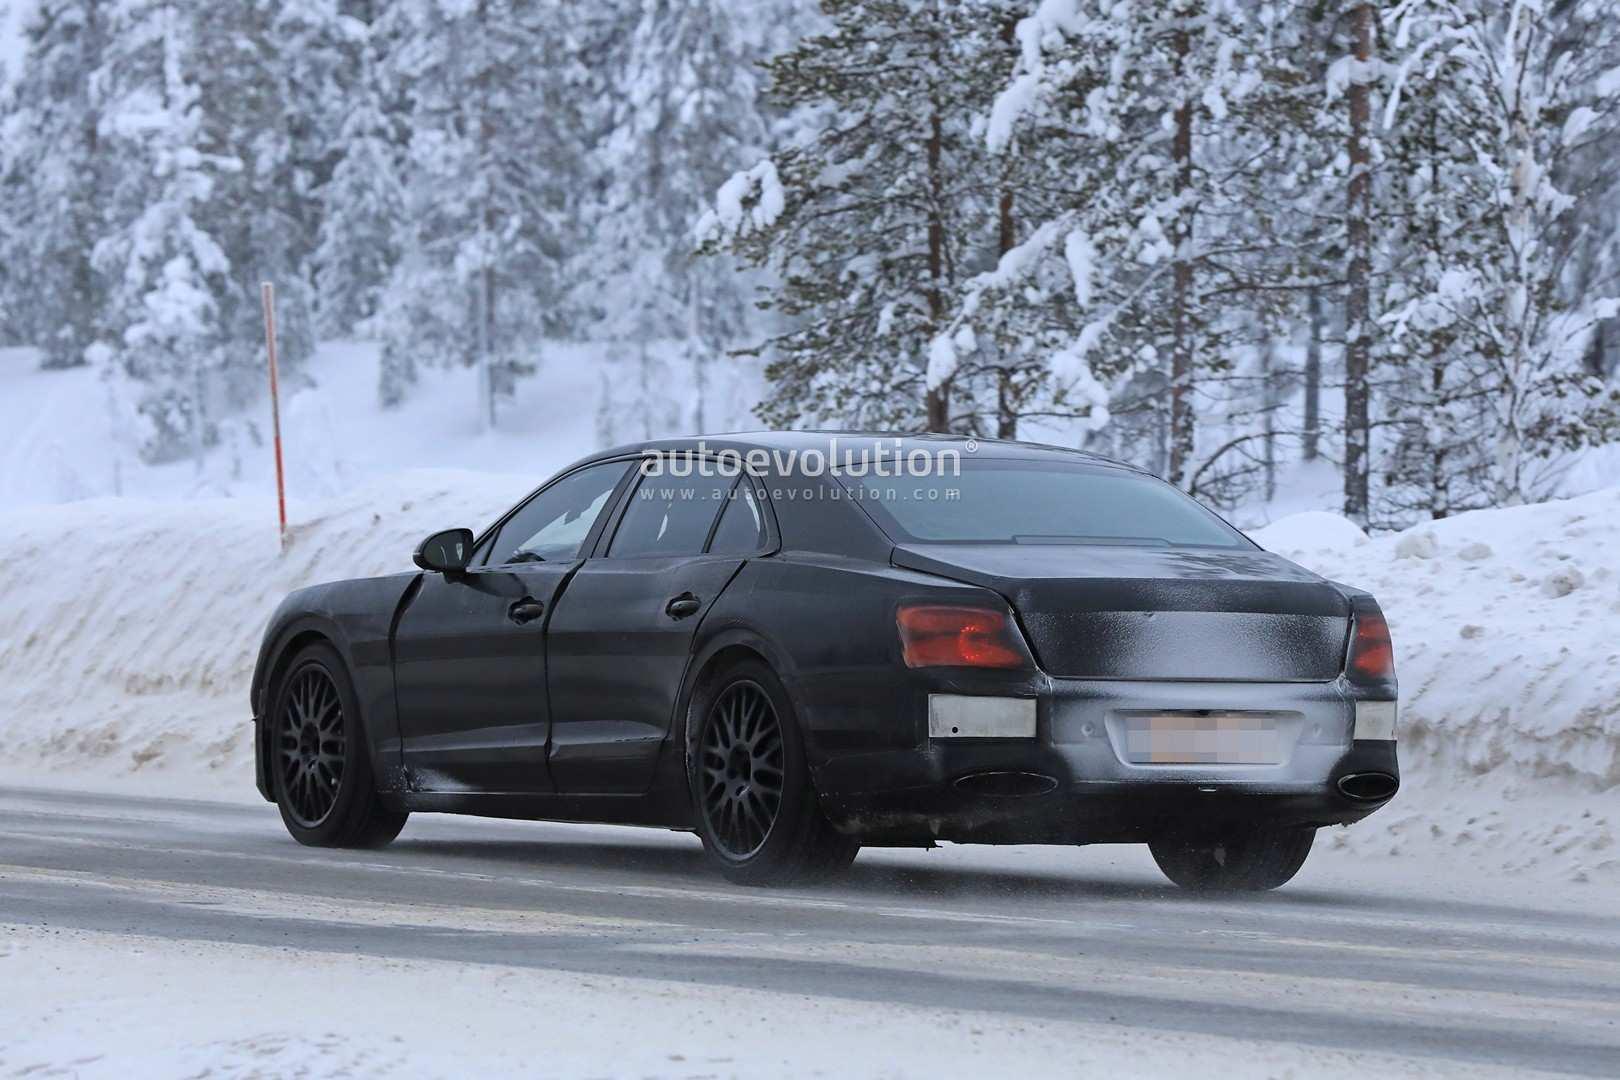 72 Gallery of 2020 Bentley Suv Review with 2020 Bentley Suv